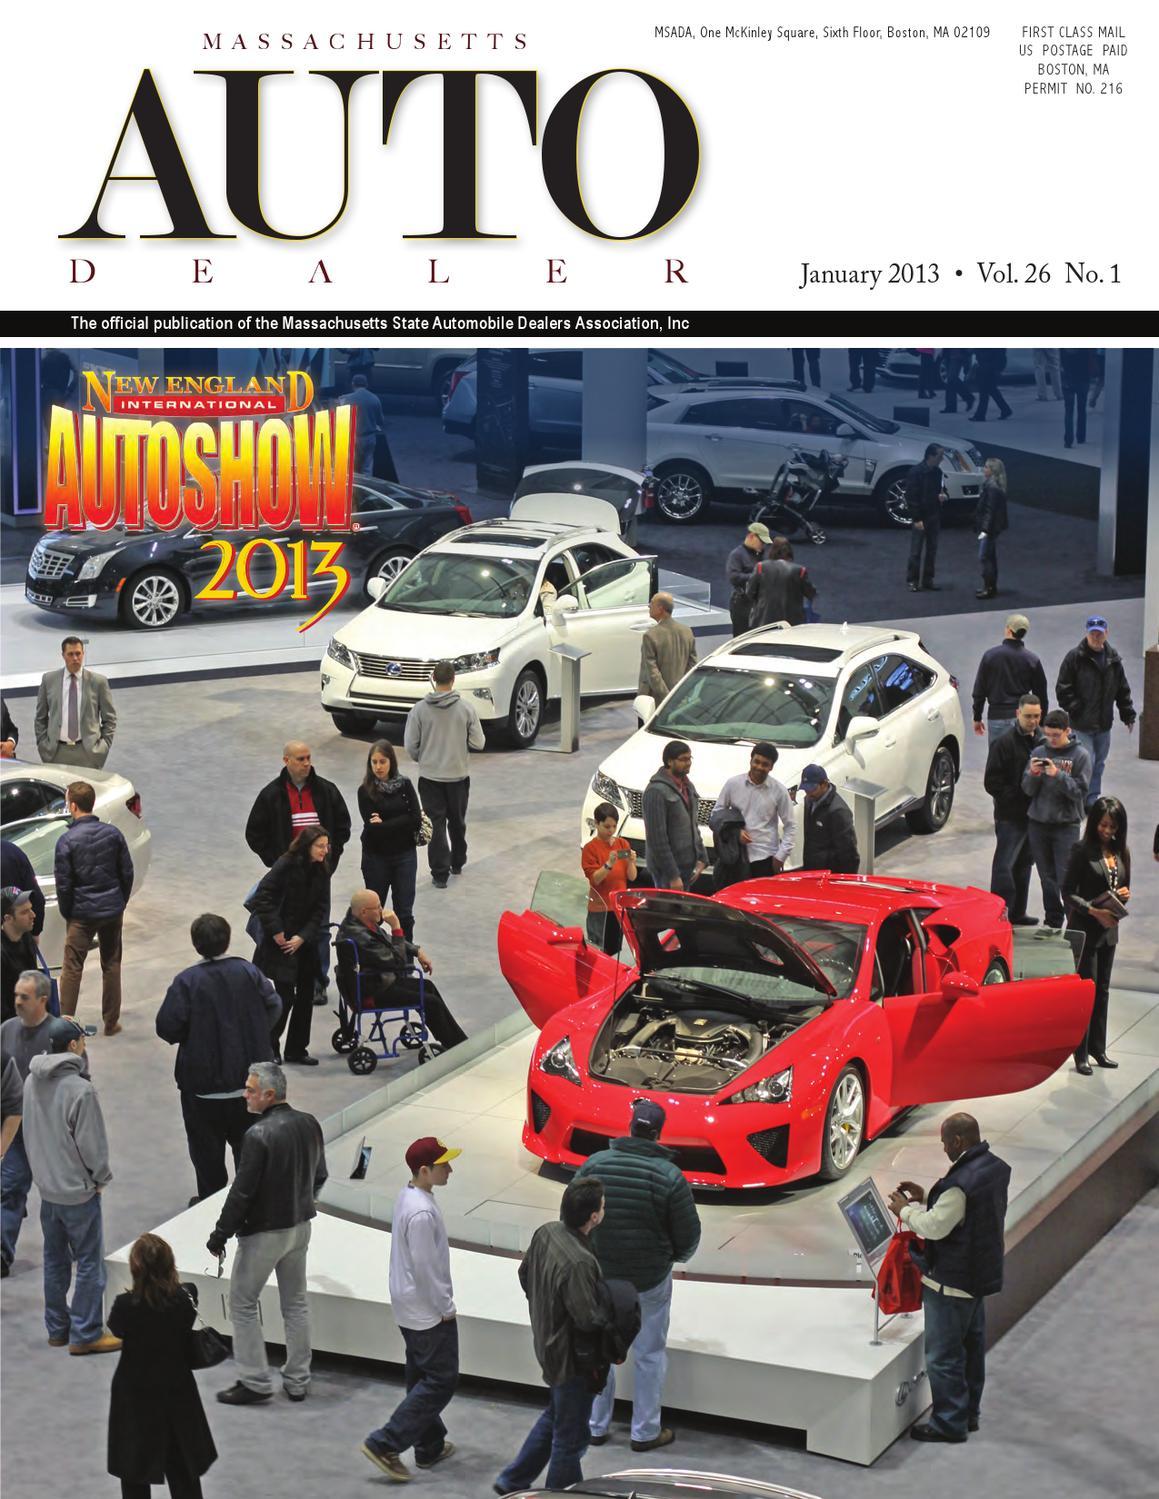 Massachusetts Auto Dealer Magazine by Massachusetts State Automobile ...